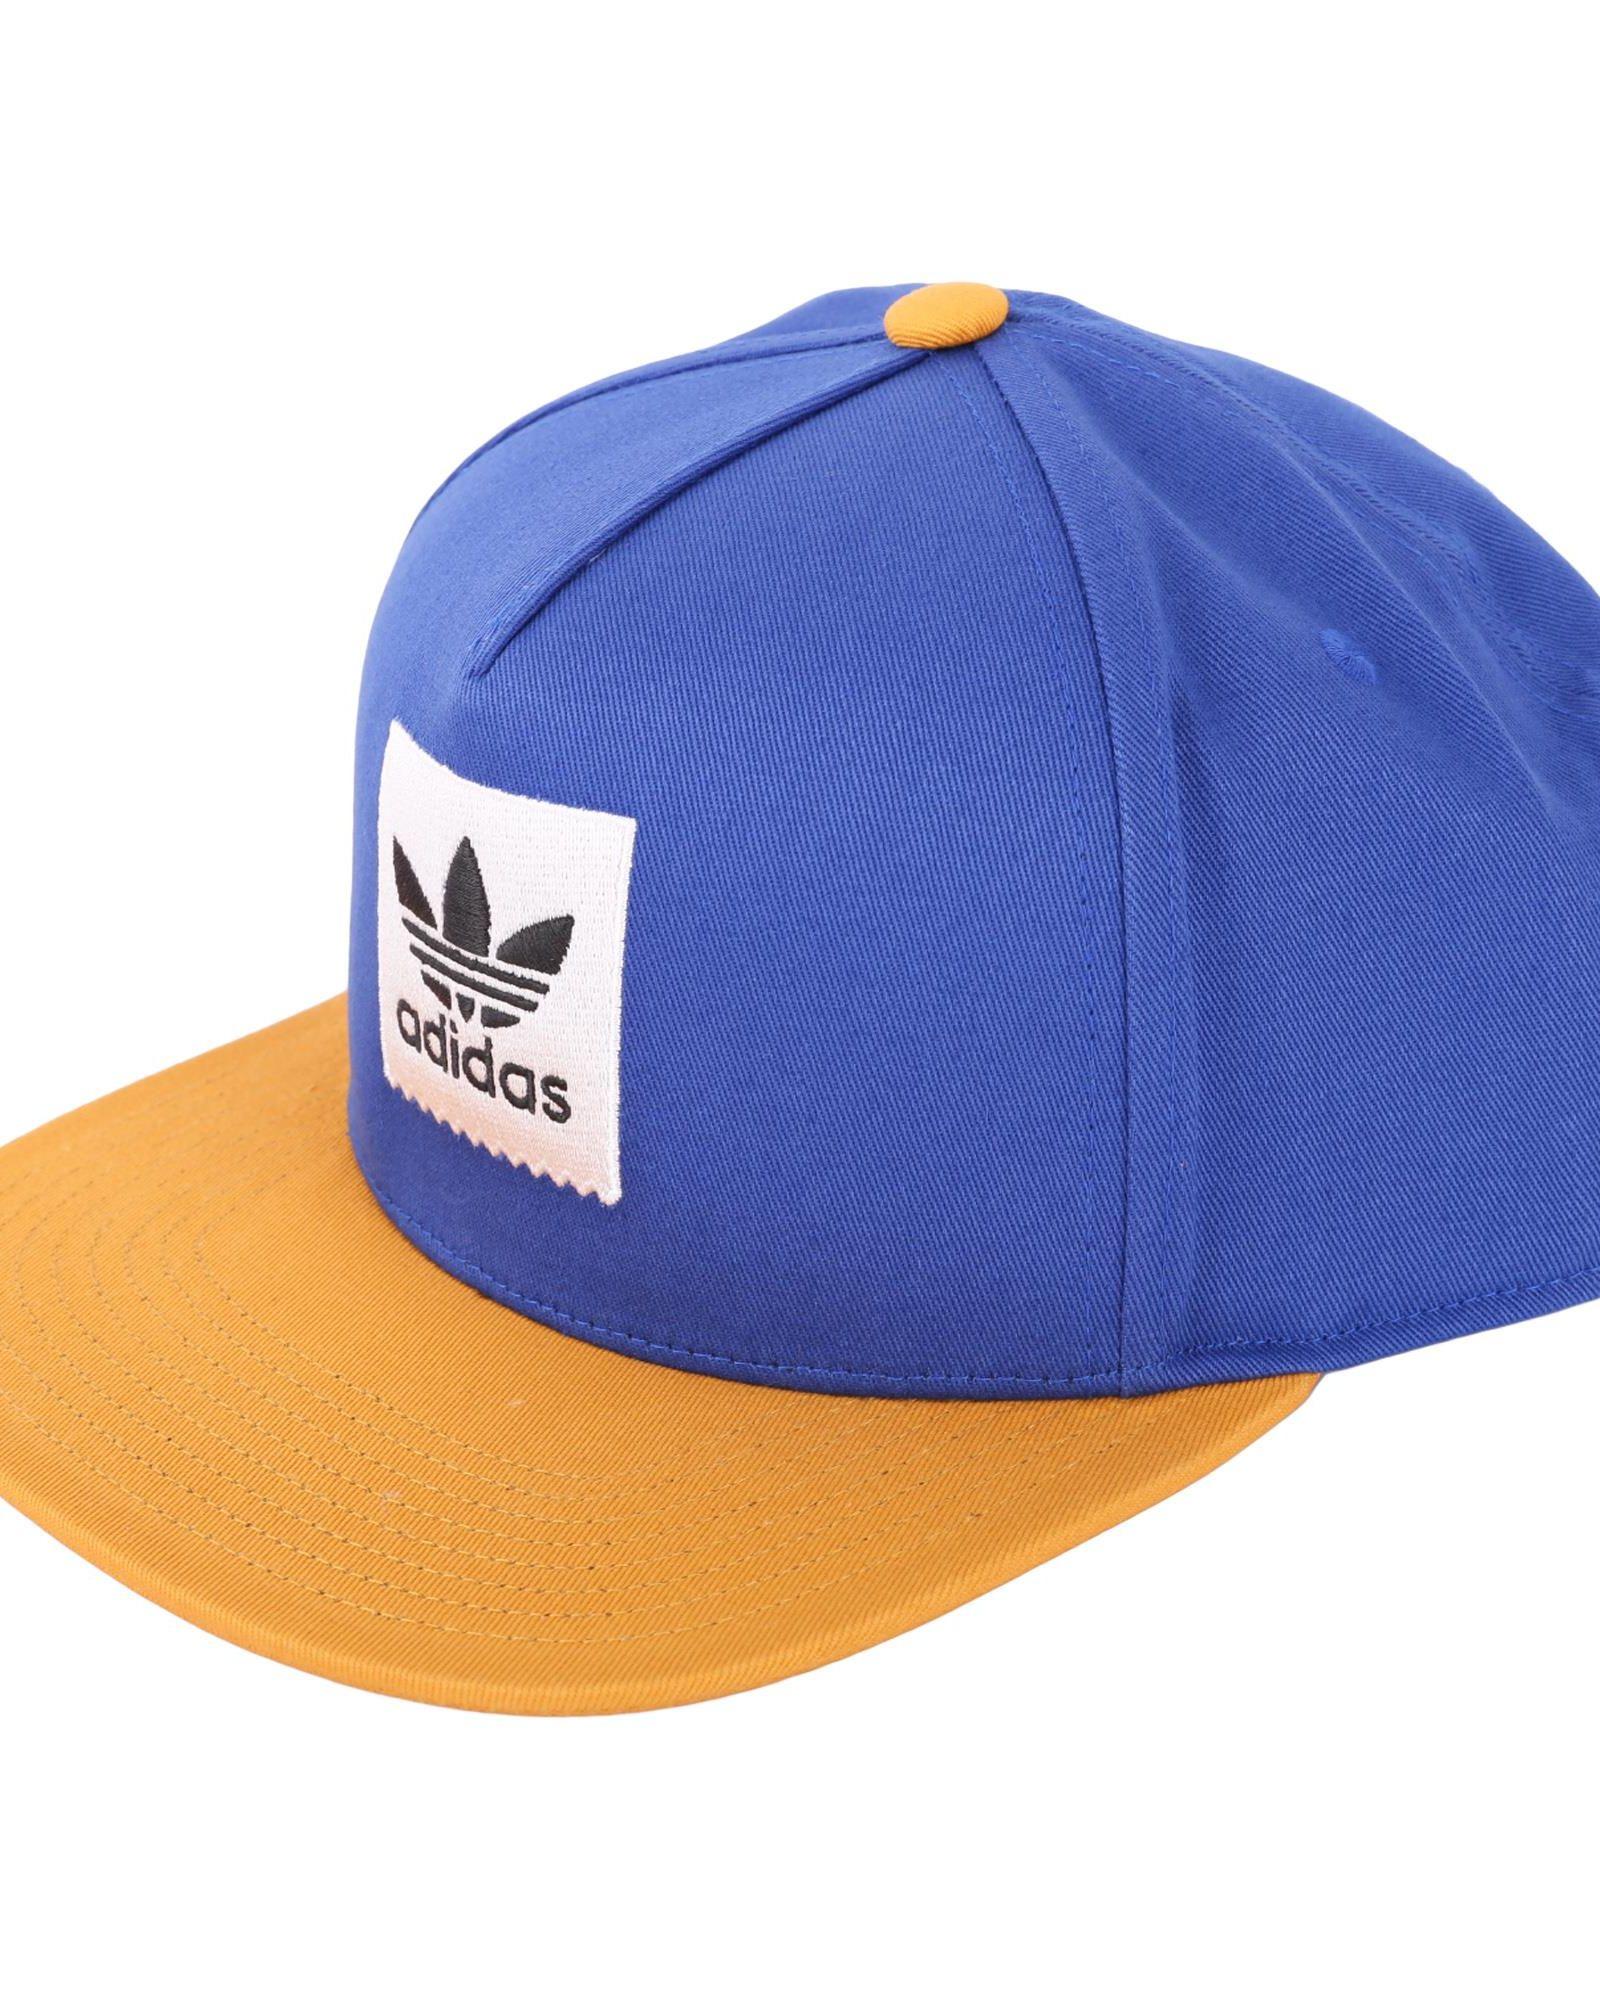 Adidas 2tone Snapback Hat